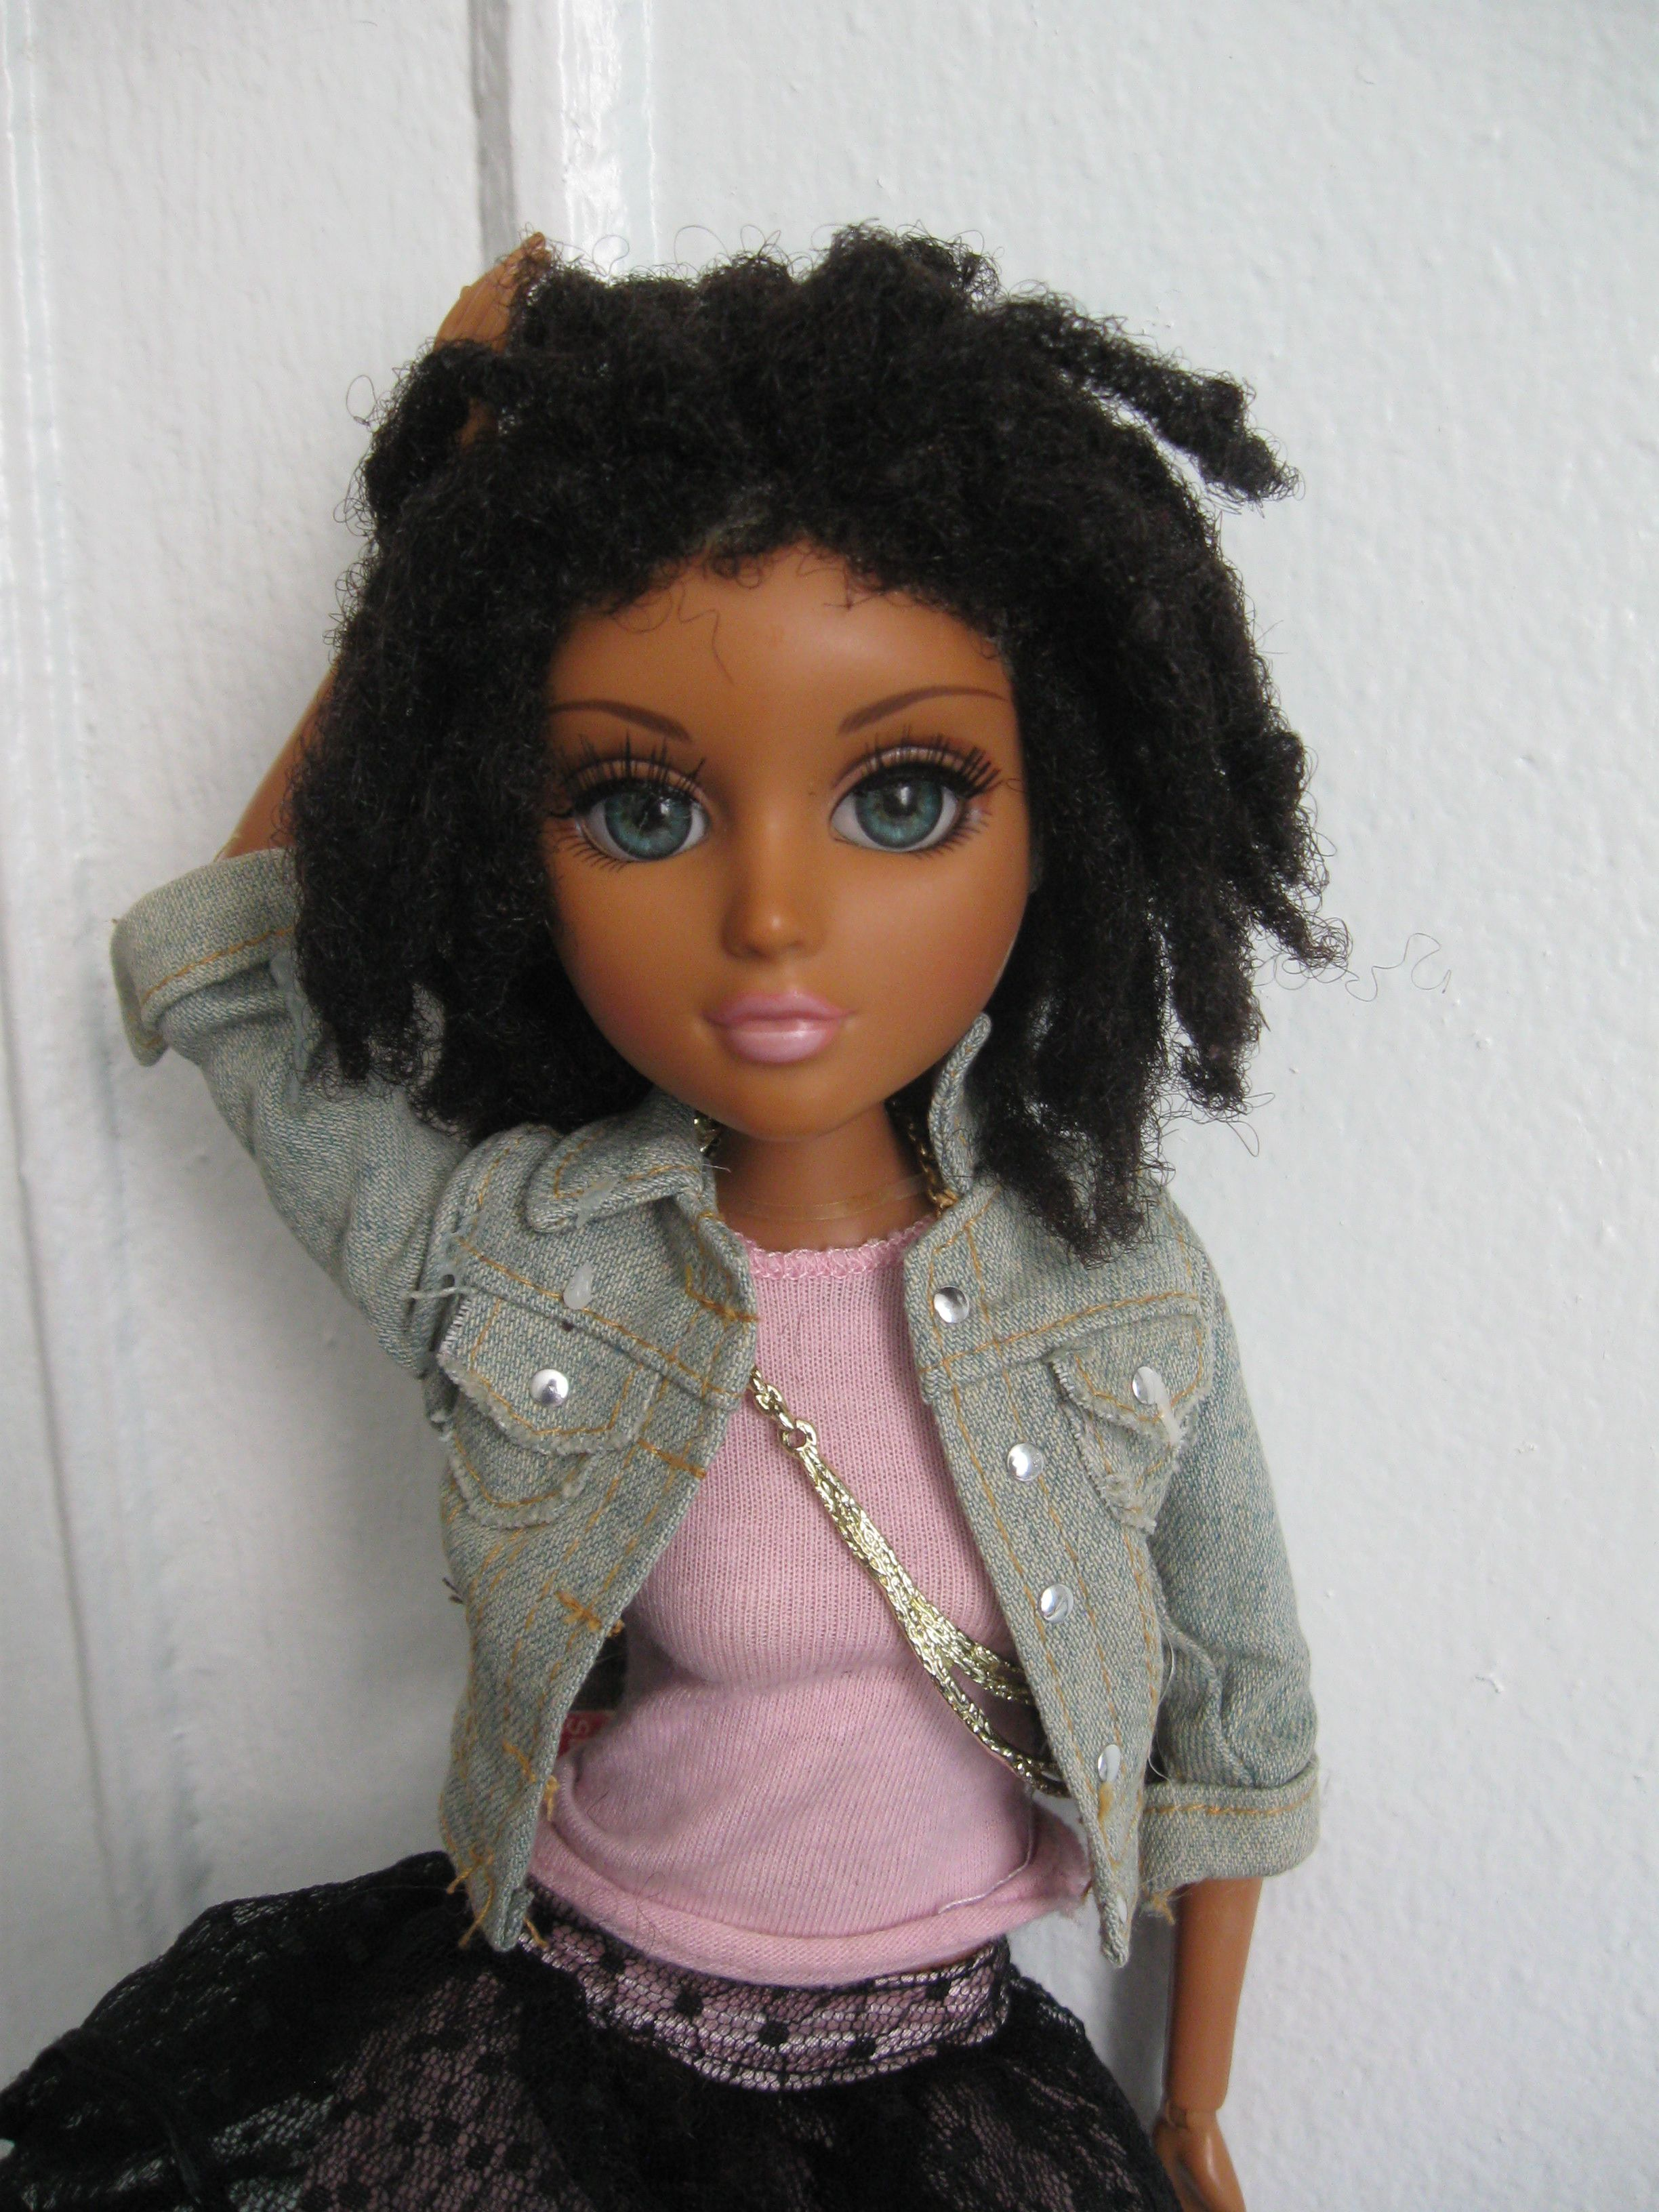 Dreadlock Wig Doll Wigs Pinterest Doll Wigs Wigs And